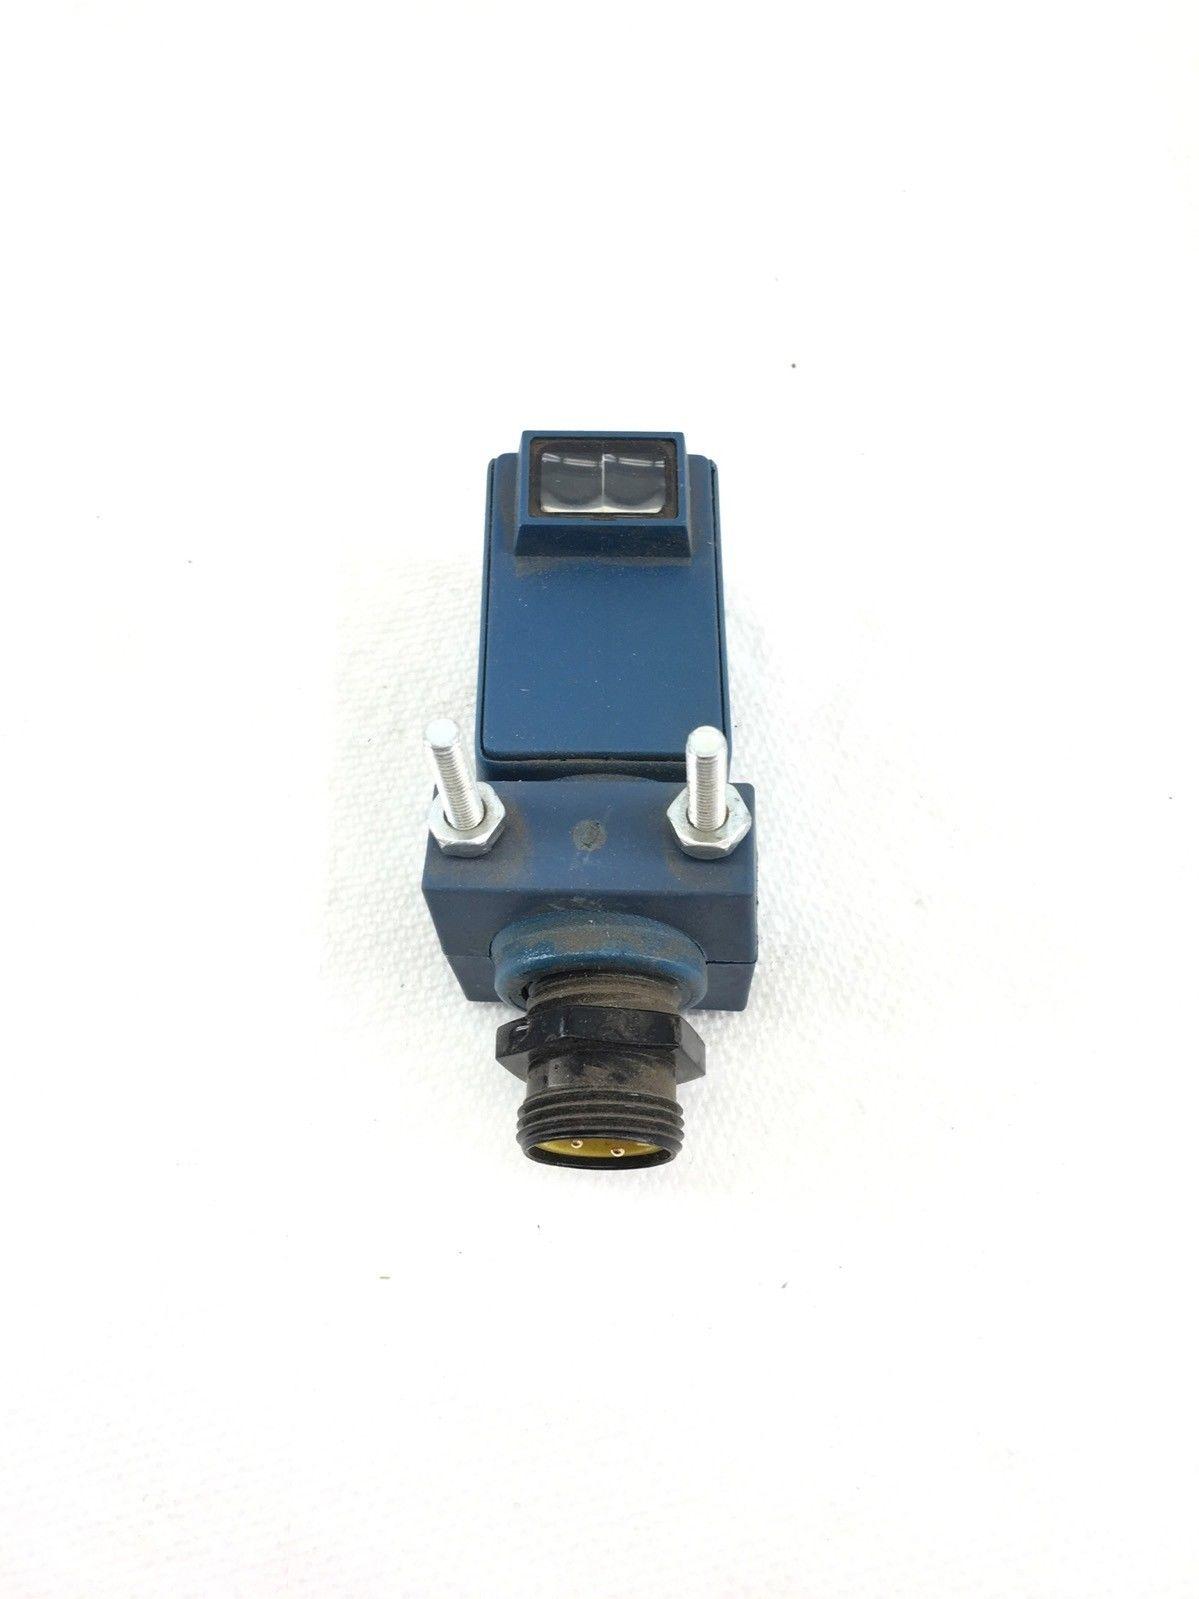 NEW EATONÂ 1356A-6503 24 INCH DIFFUSE REFLECTIVE, 20-264 VAC, 15-30 VDC, (A594) 1